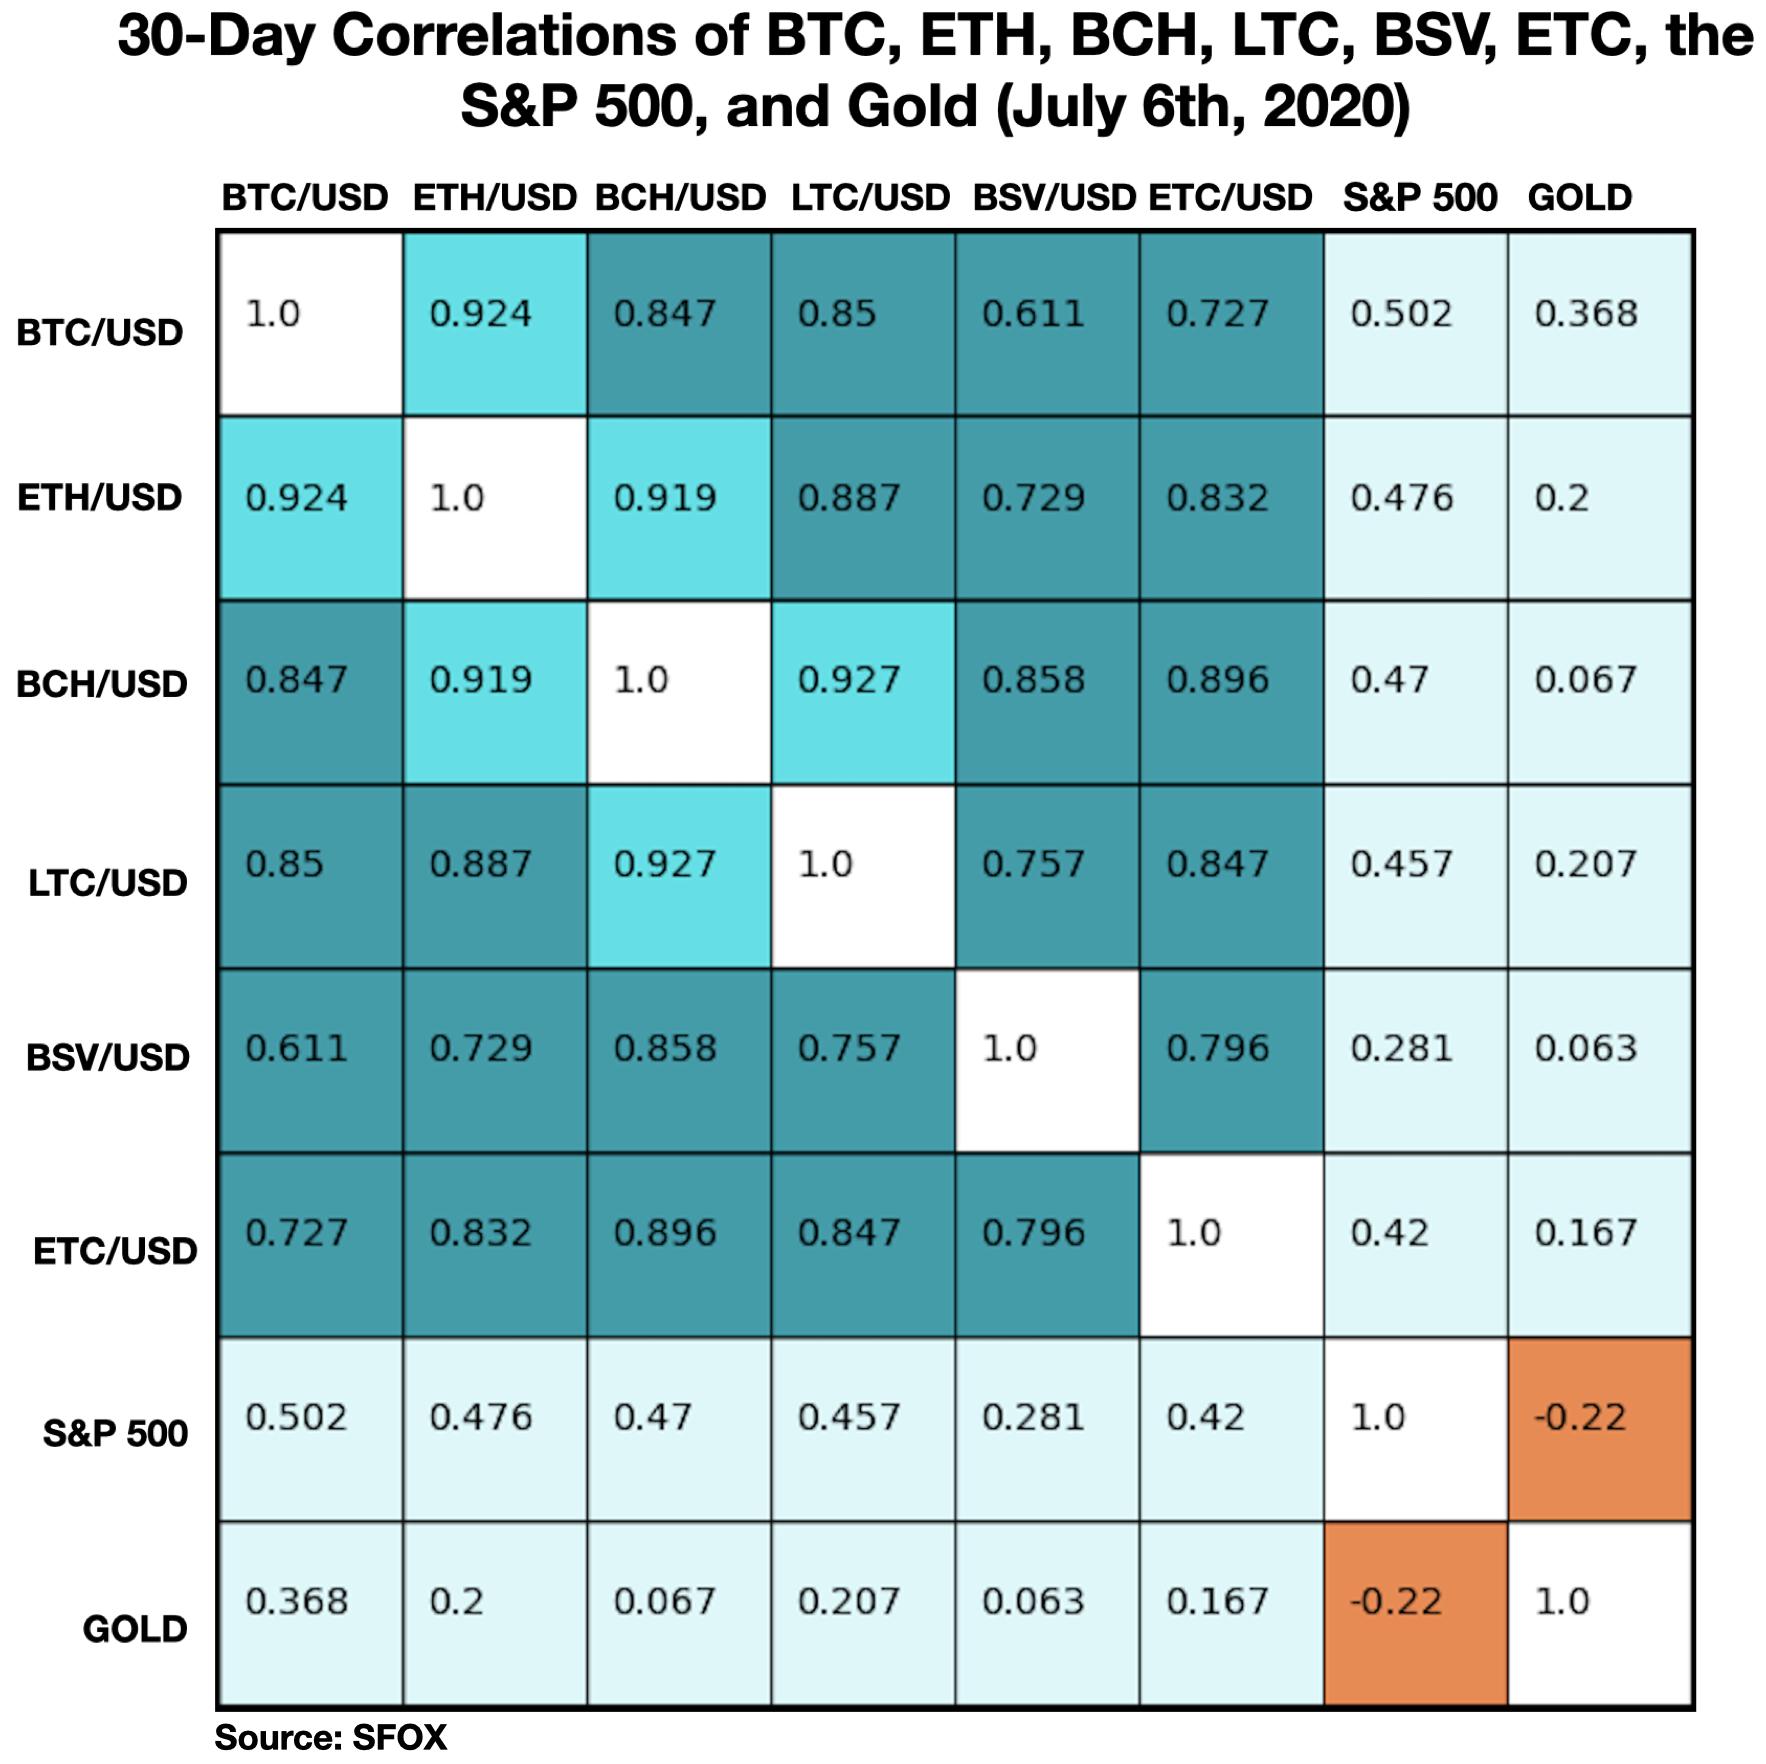 Bitcoin crypto S&P 500 gold correlations table July 2020.